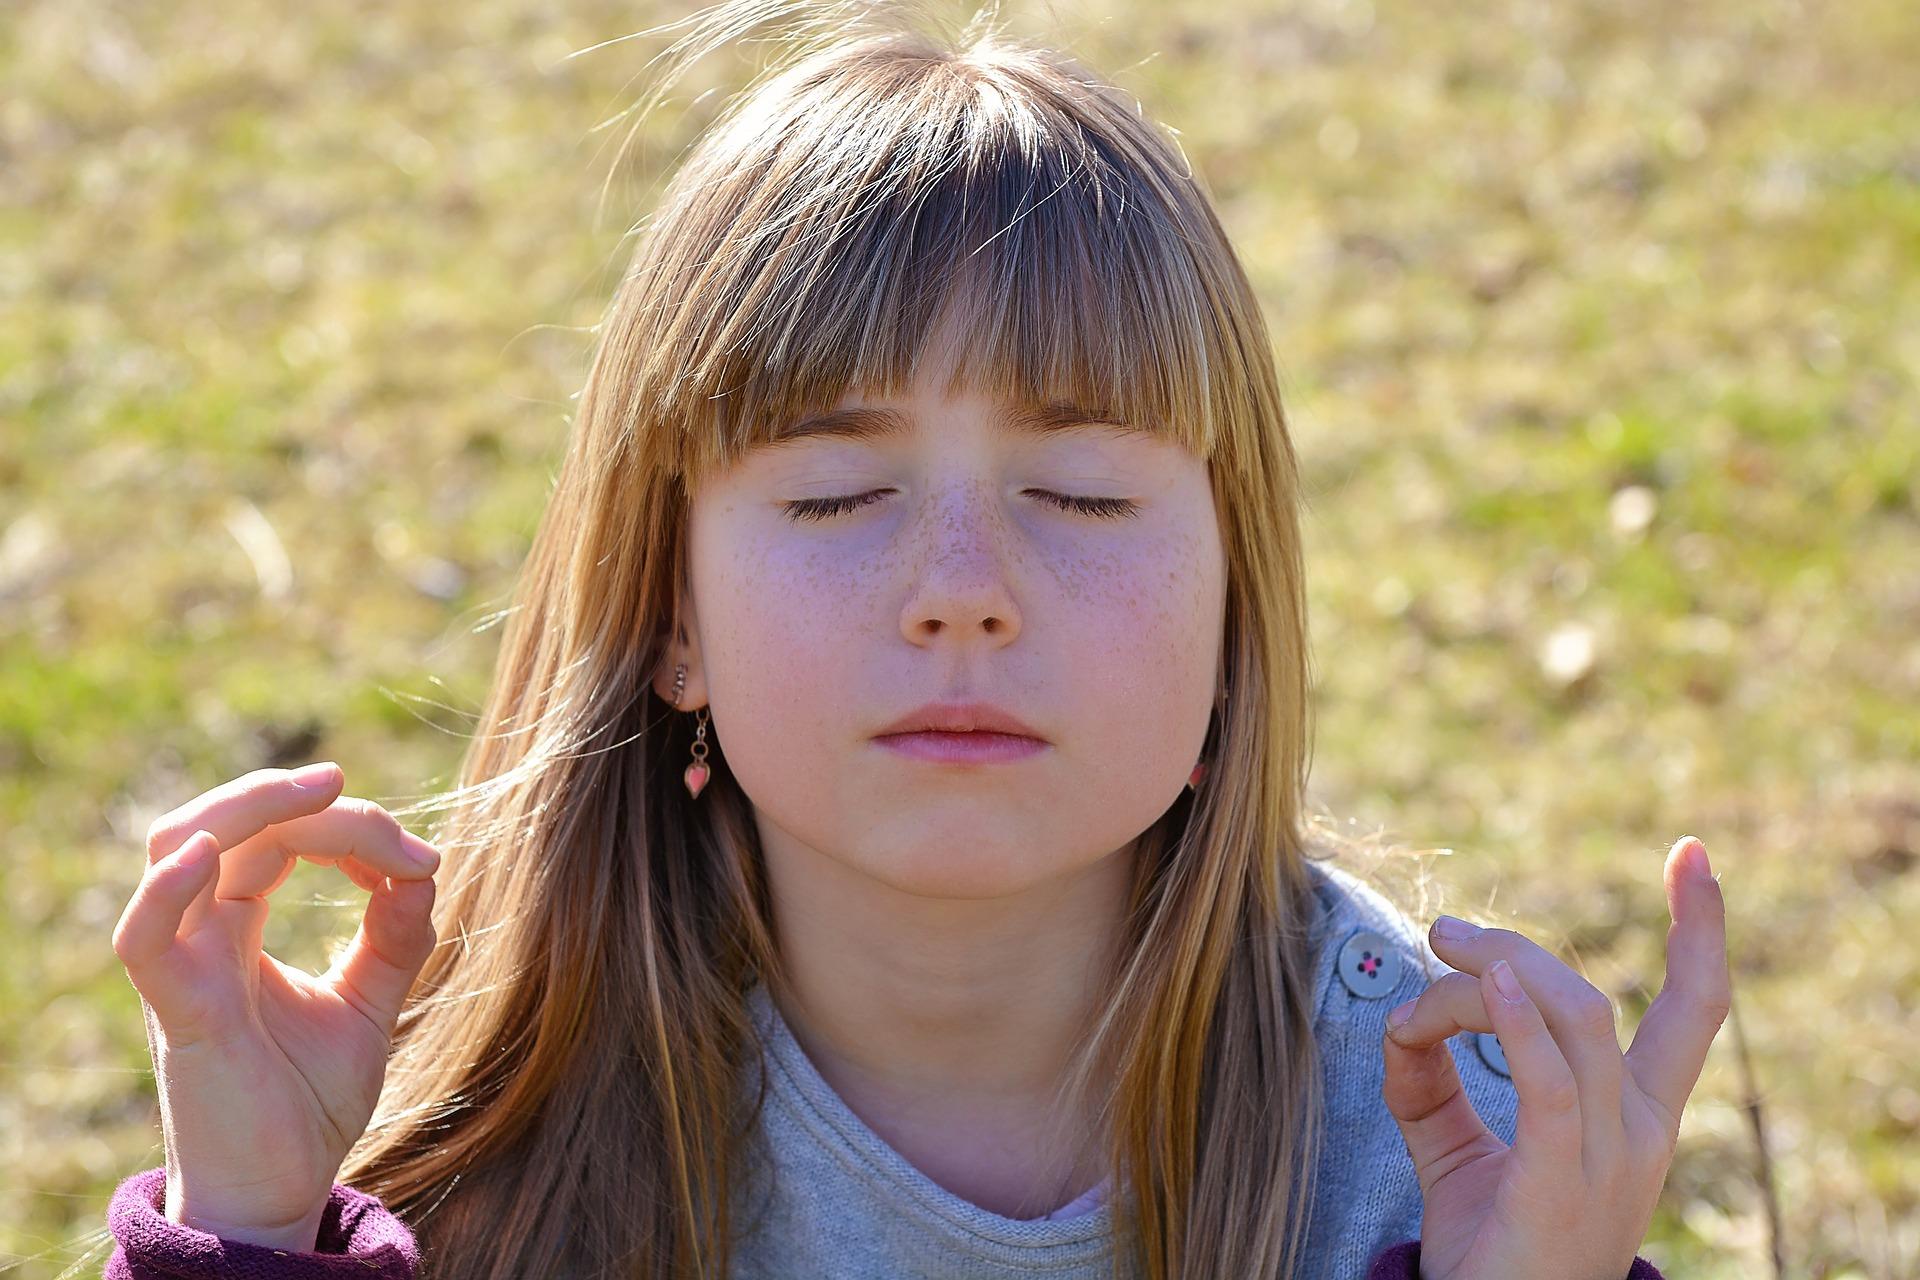 Rituale in der Schule (Leserfragen I): Aufgedrehte Schüler beruhigen